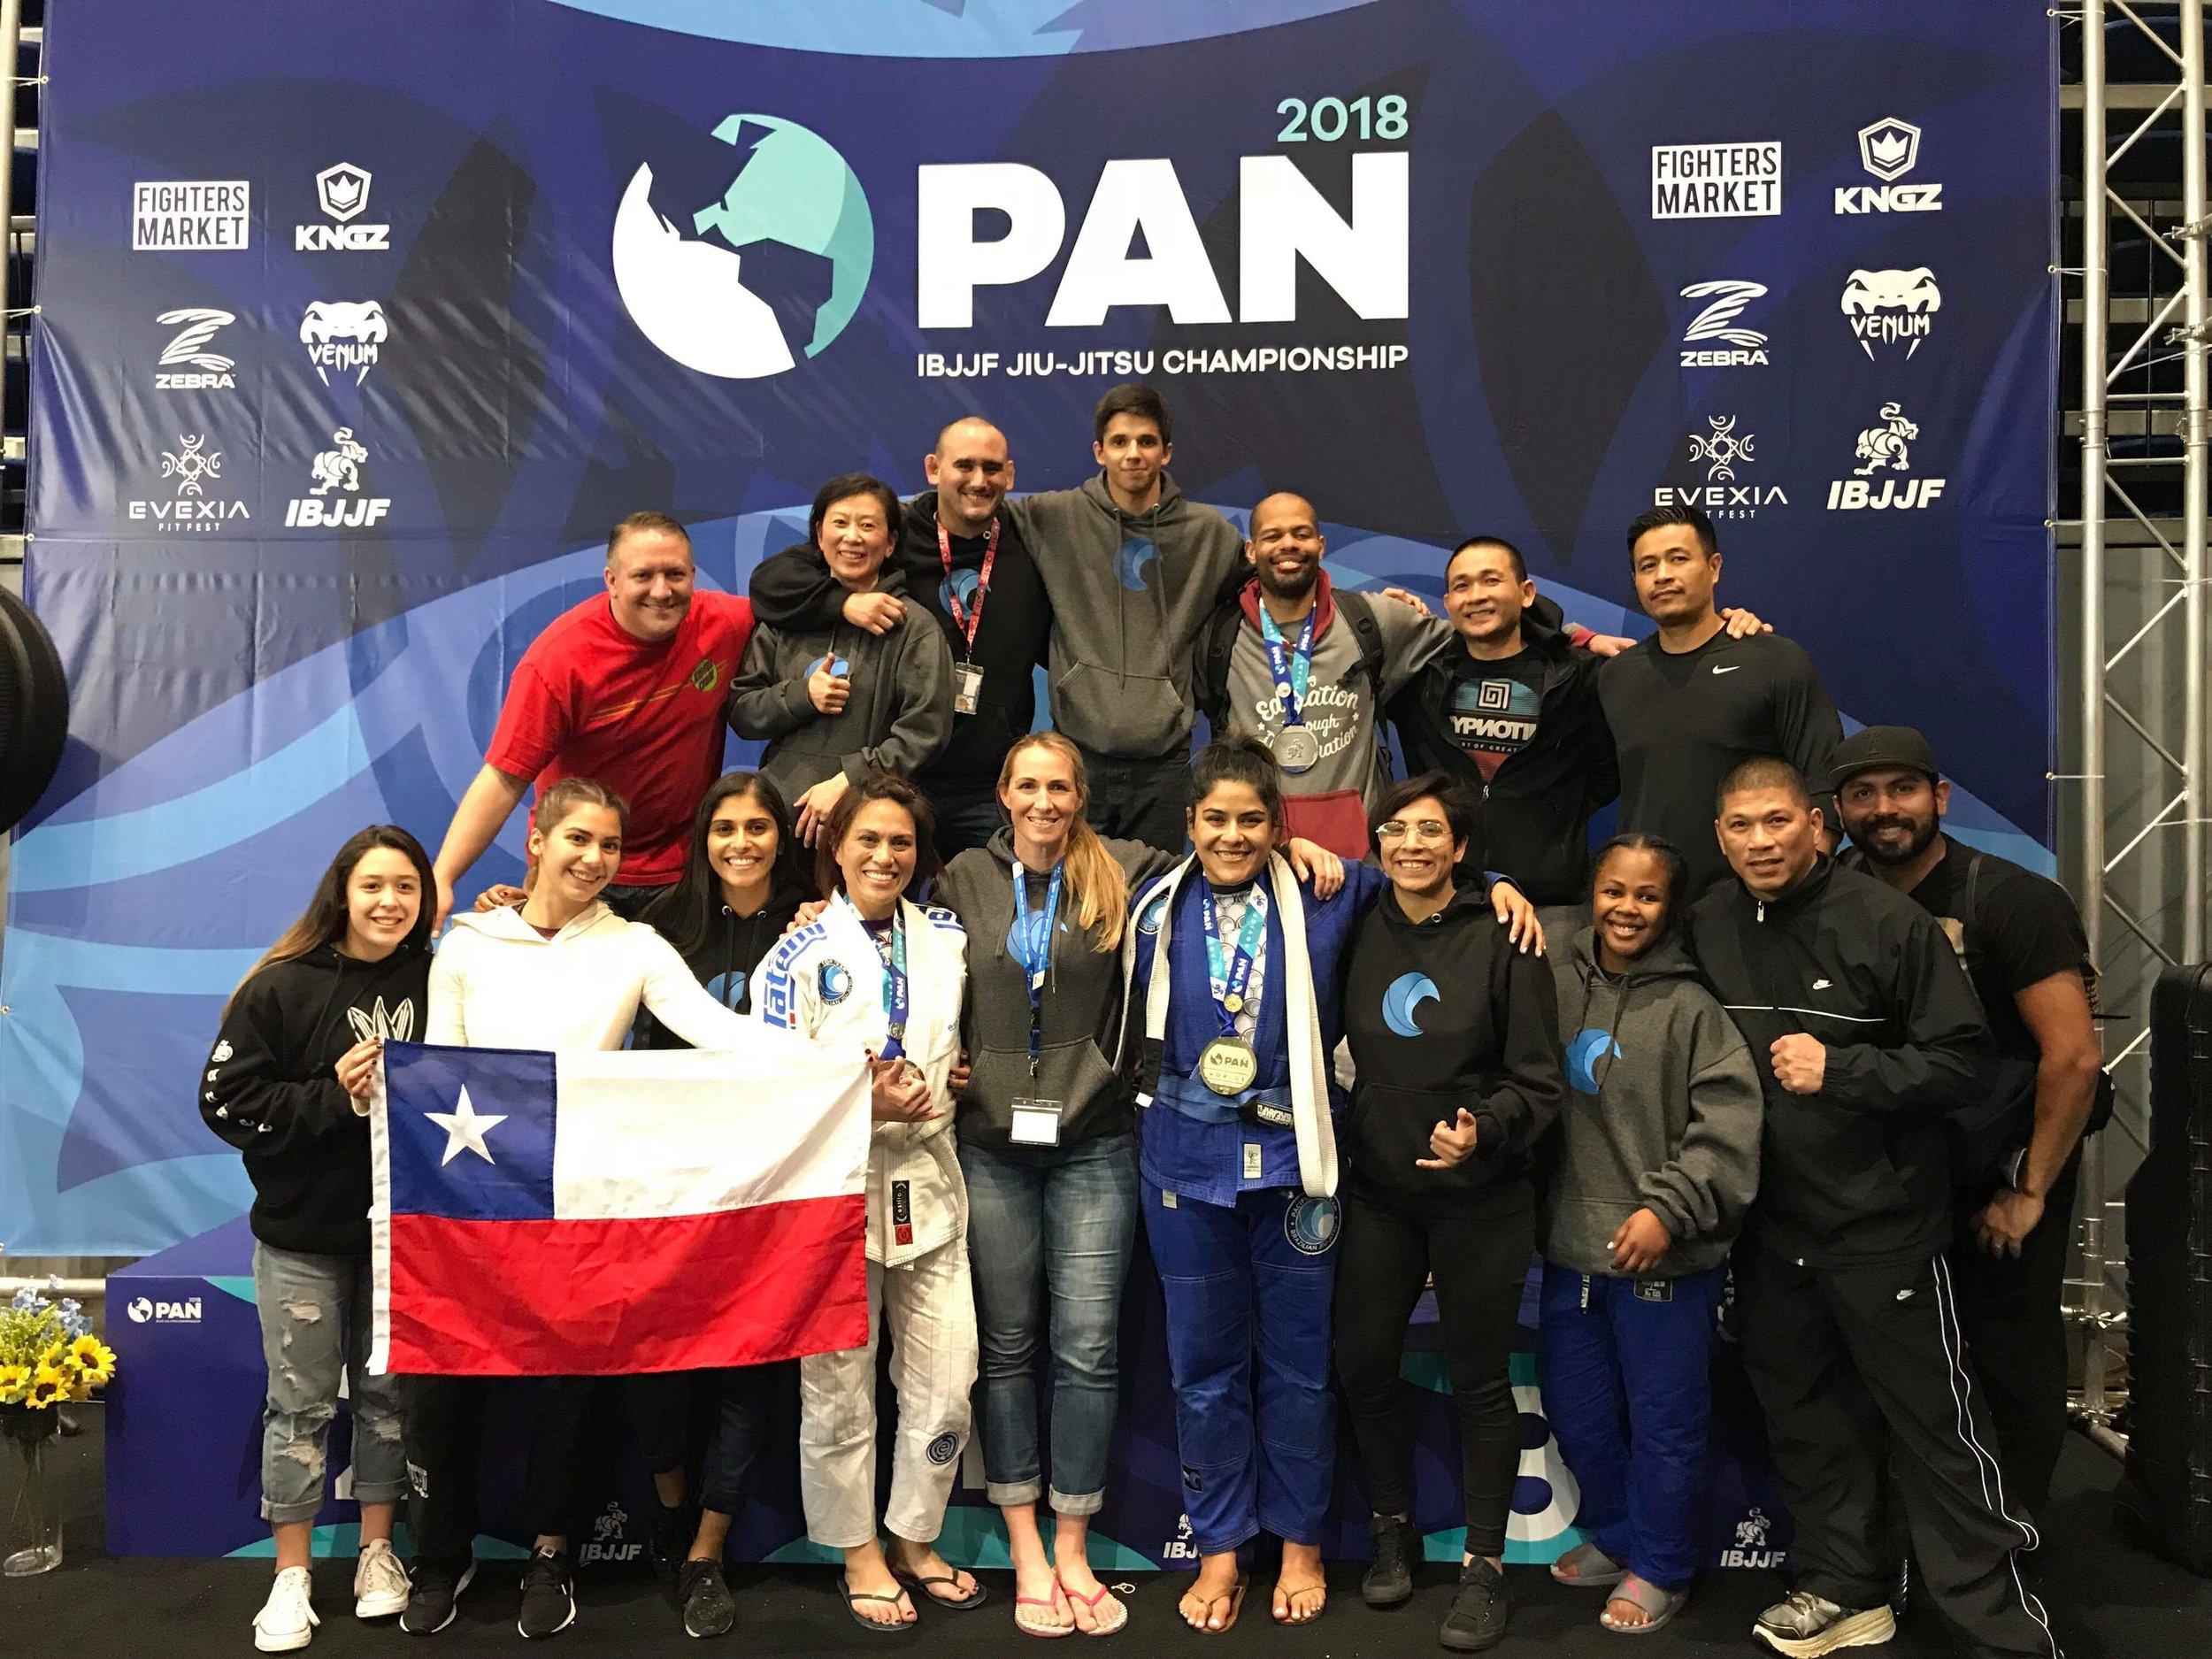 CAMP MEMBERS AT THE 2018 IBJJF PAN AMS CHAMPIONSHIP